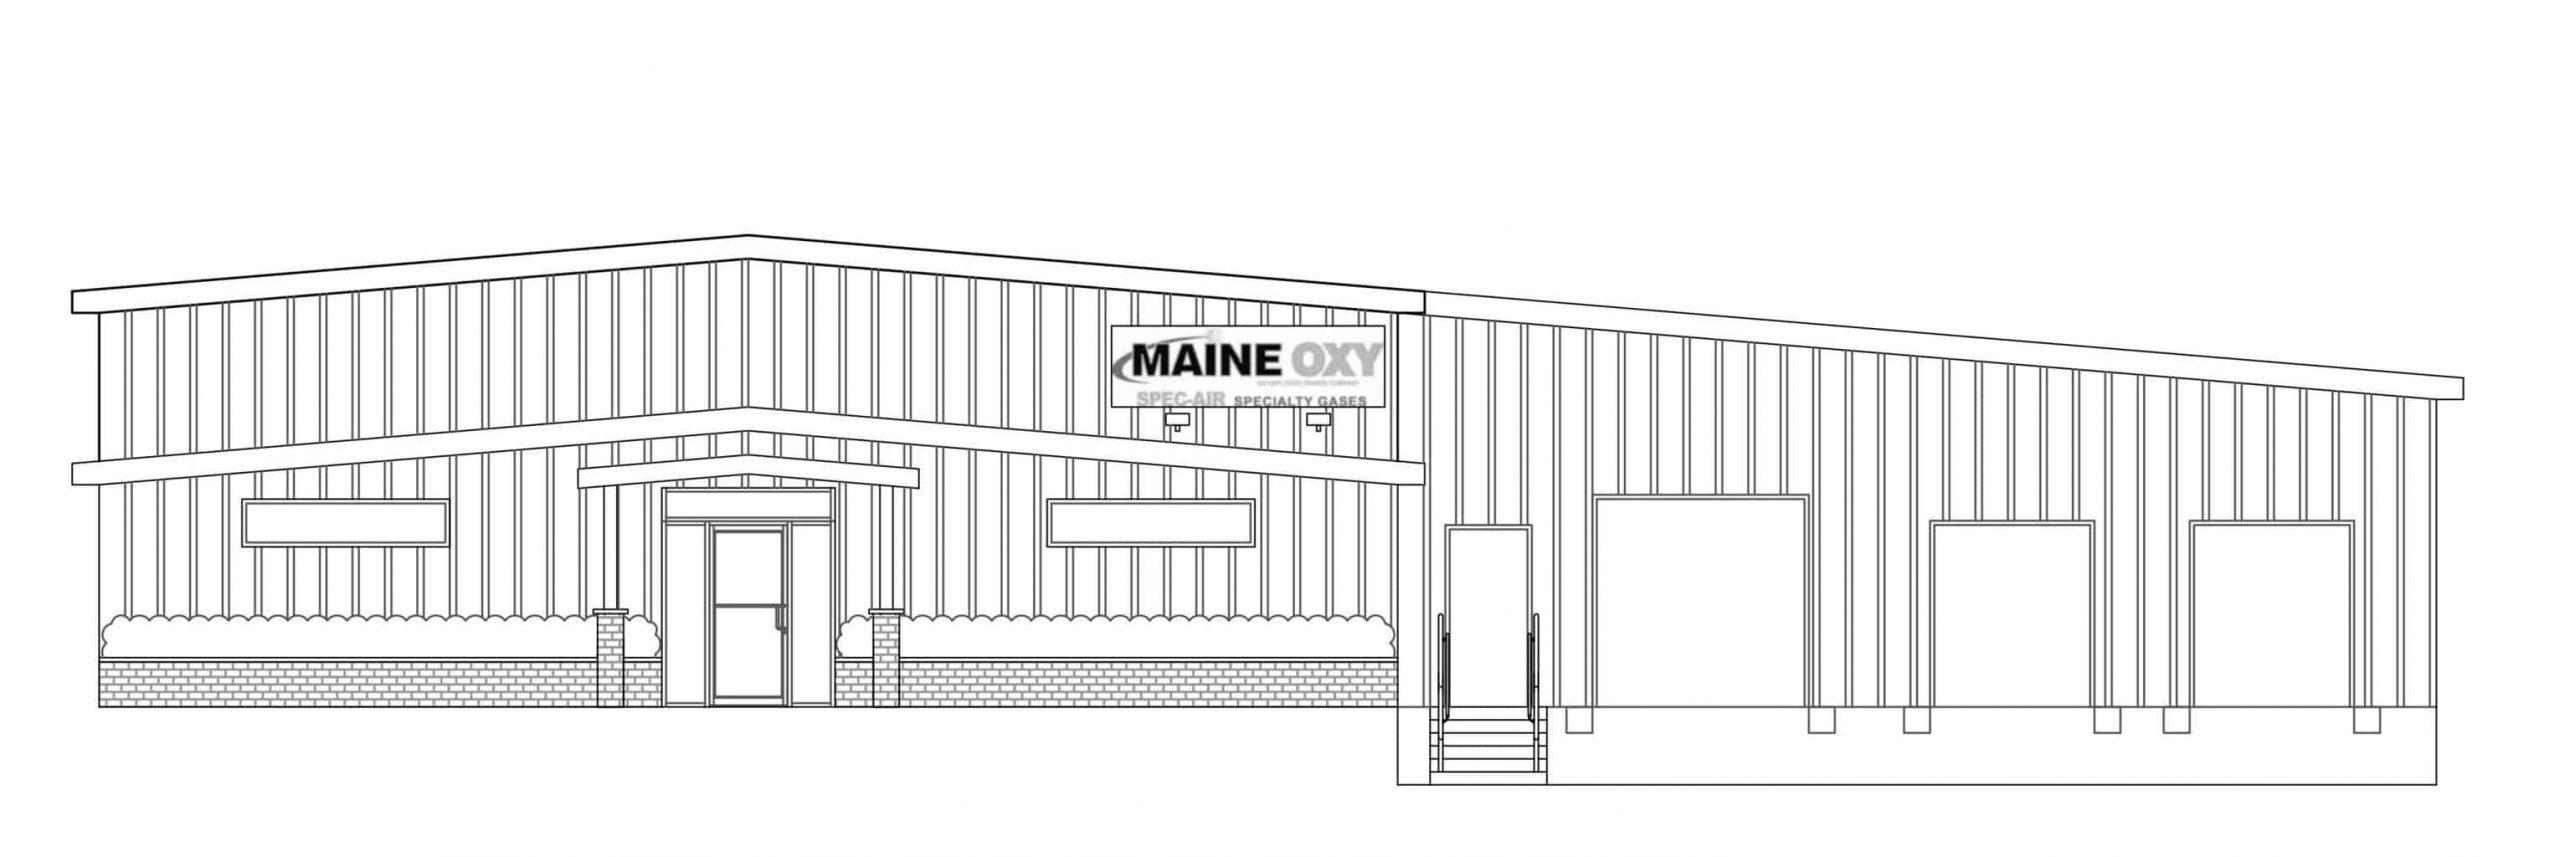 Maine Oxy rendering